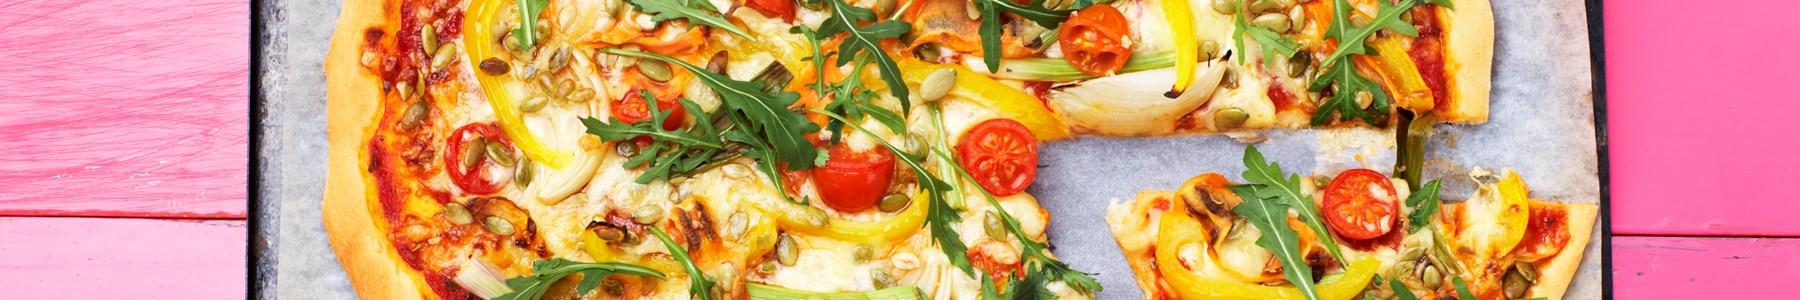 Fennikel + Hovedretter + Mozzarella